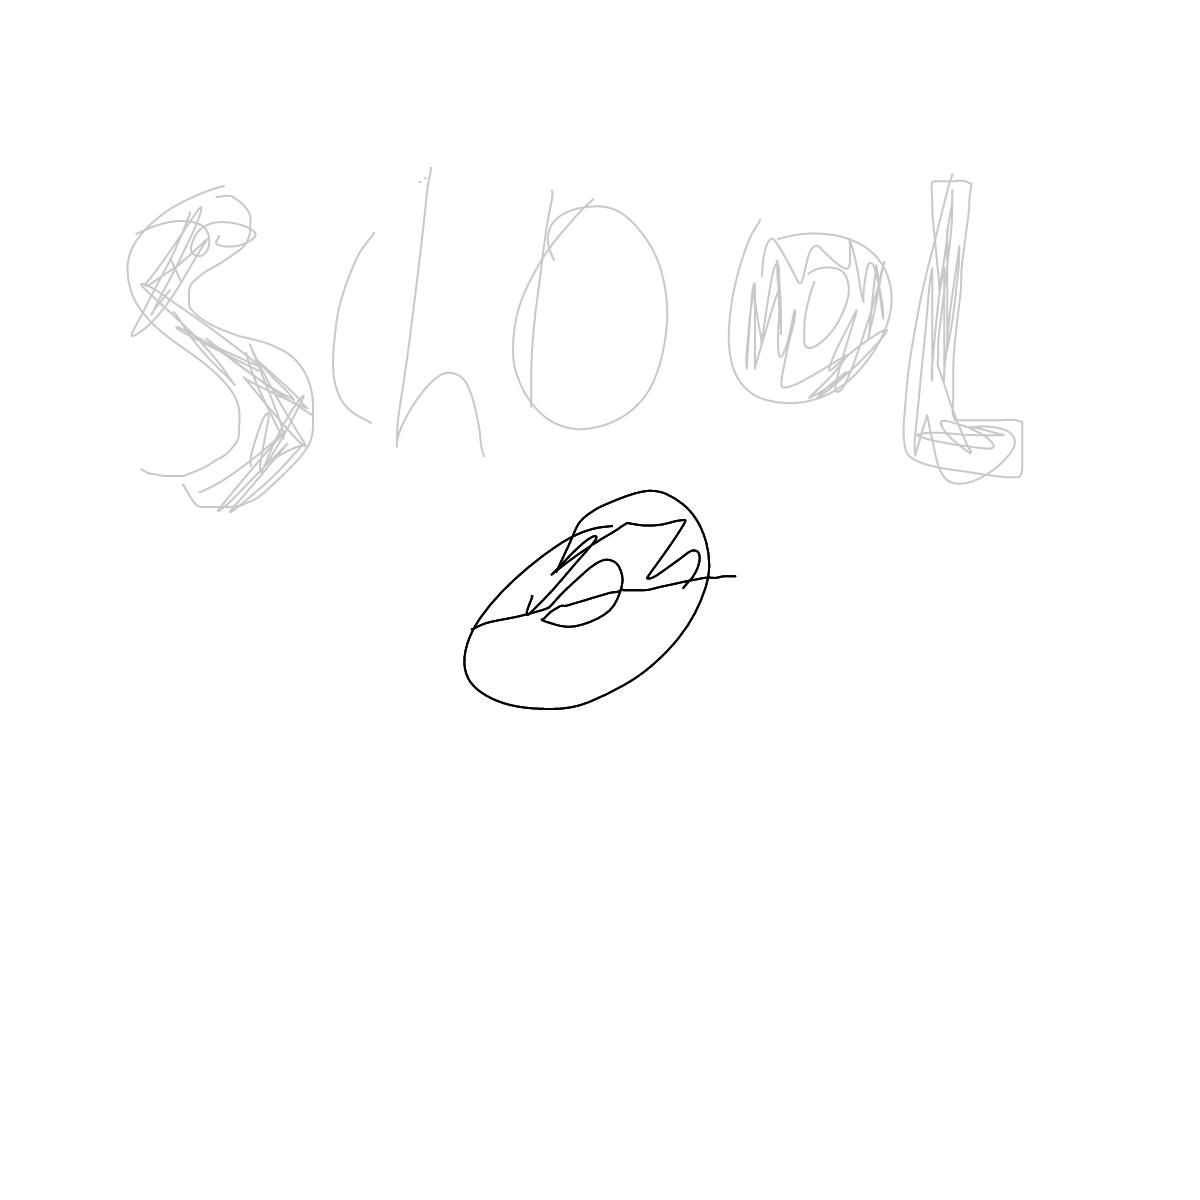 BAAAM drawing#22360 lat:40.5967102050781250lng: -73.9483718872070300